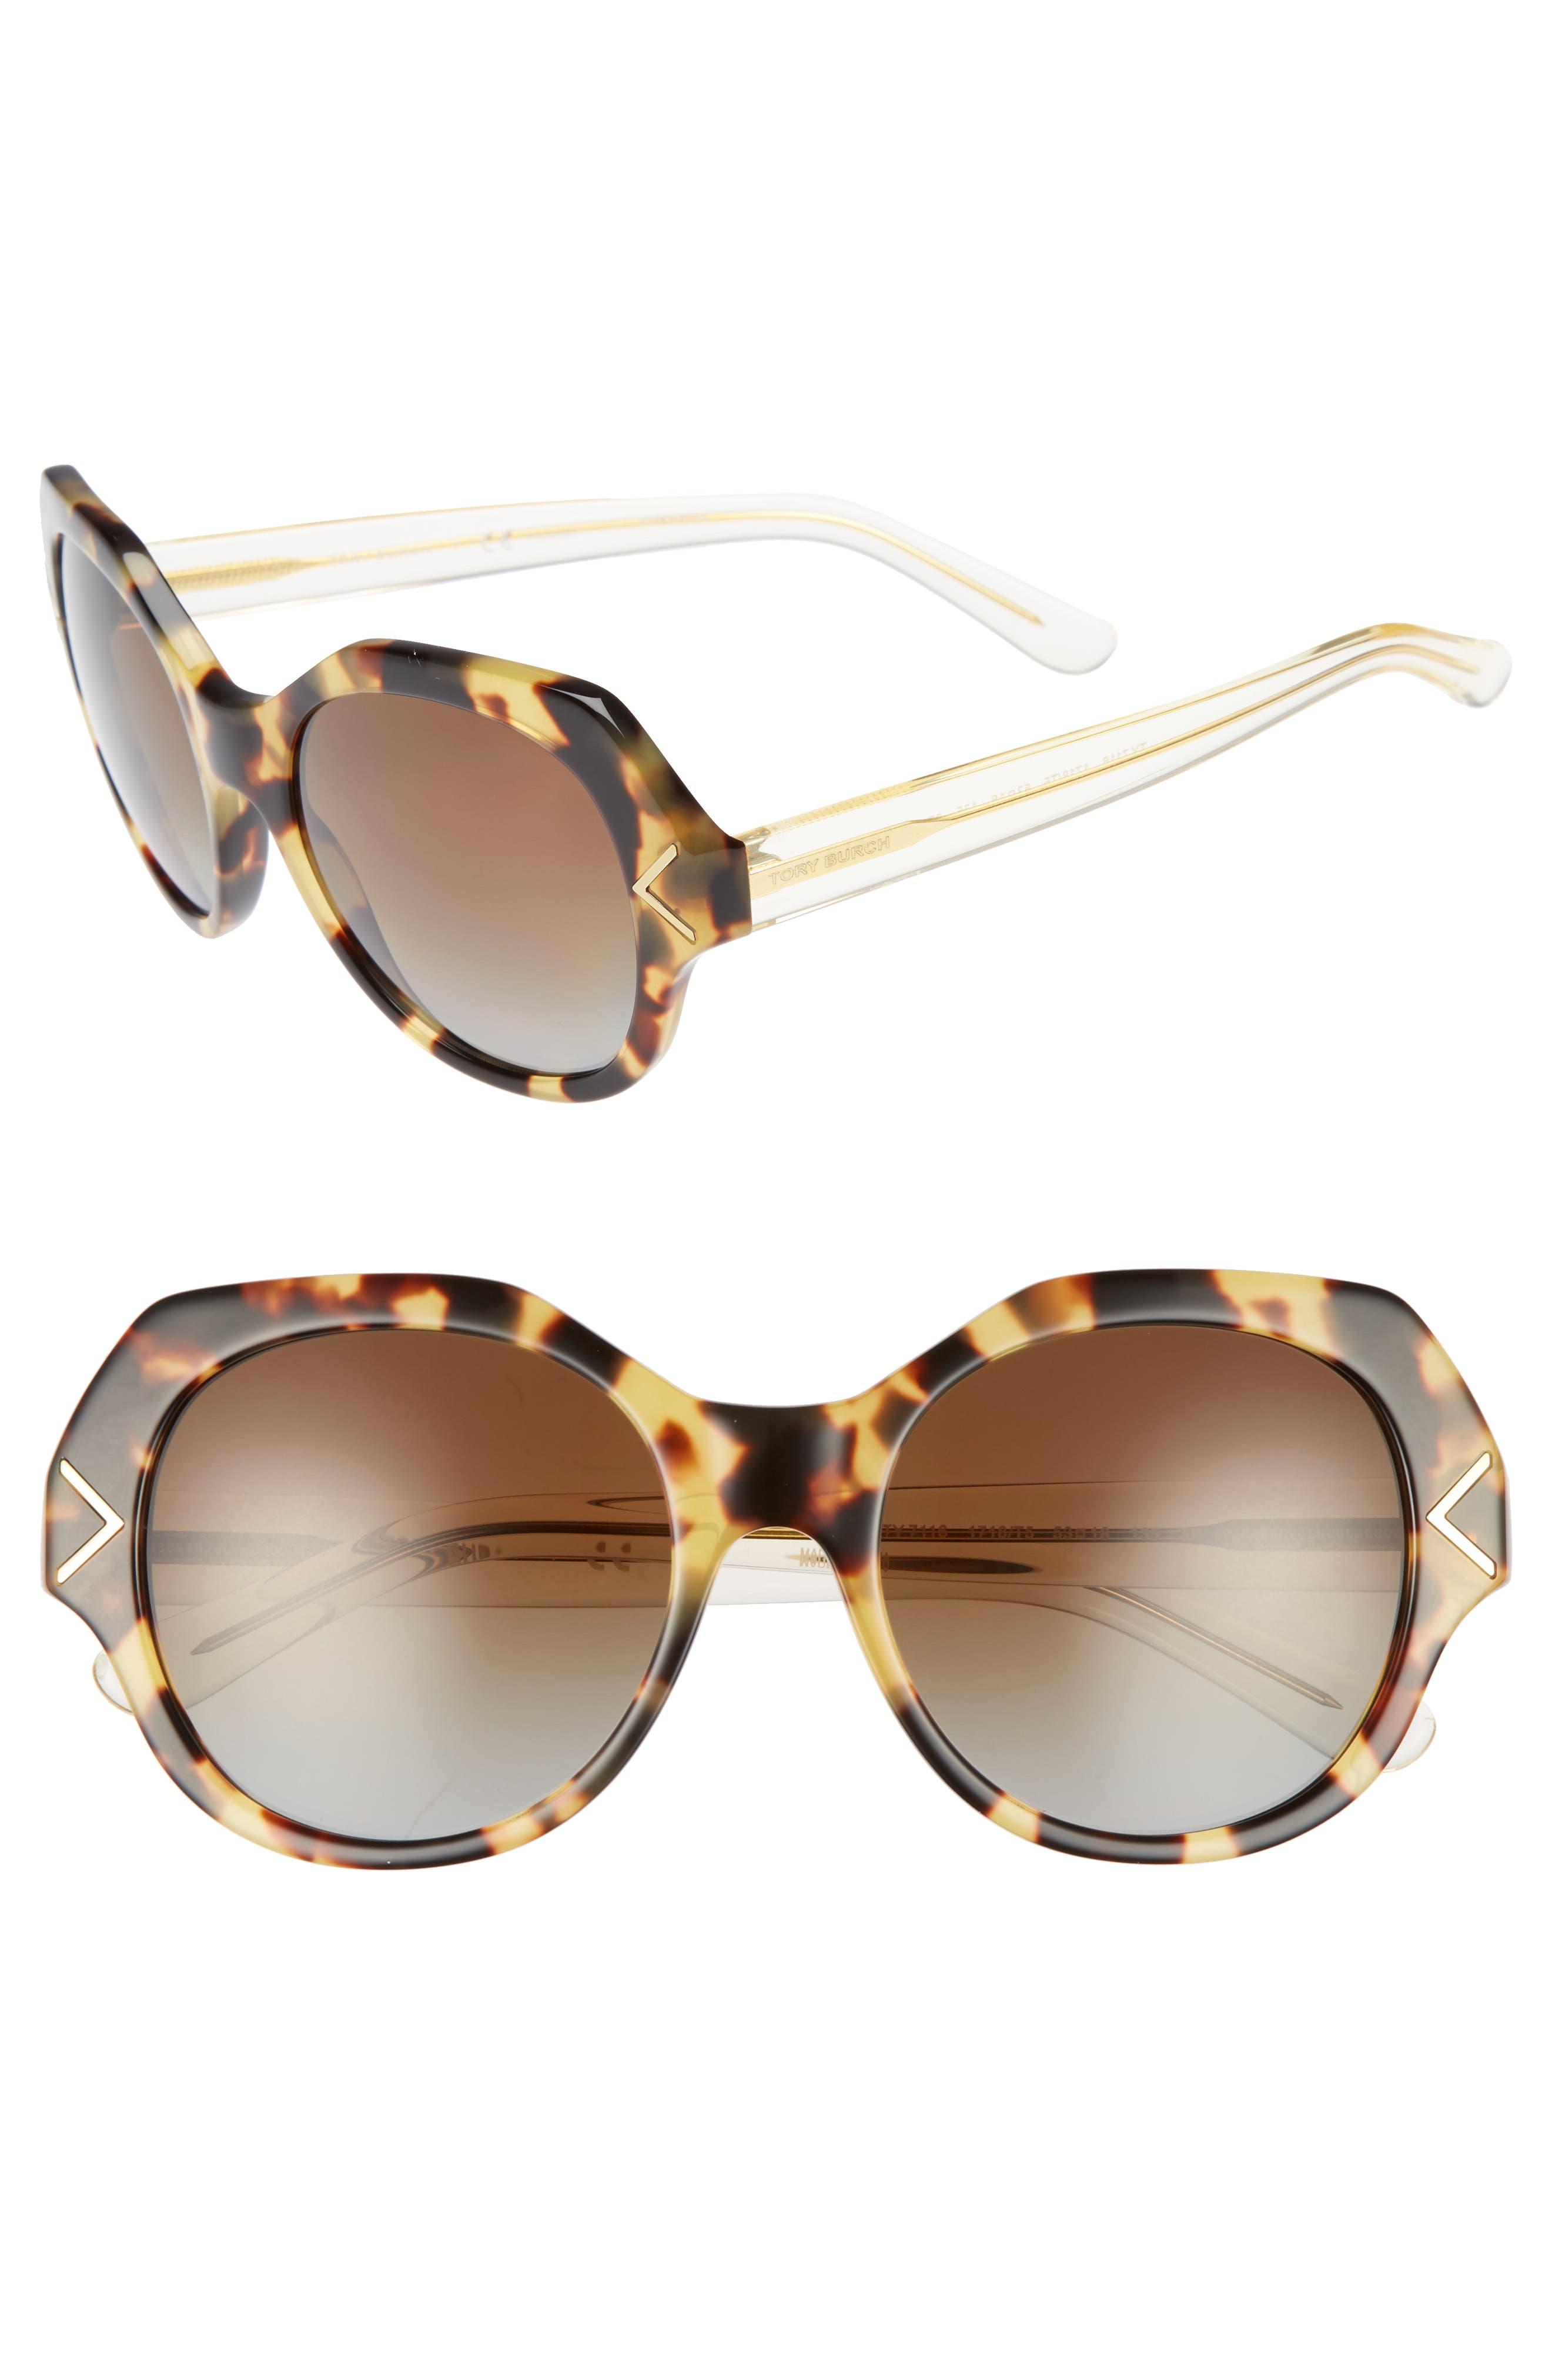 53mm Polarized Gradient Geometric Sunglasses,                             Main thumbnail 2, color,